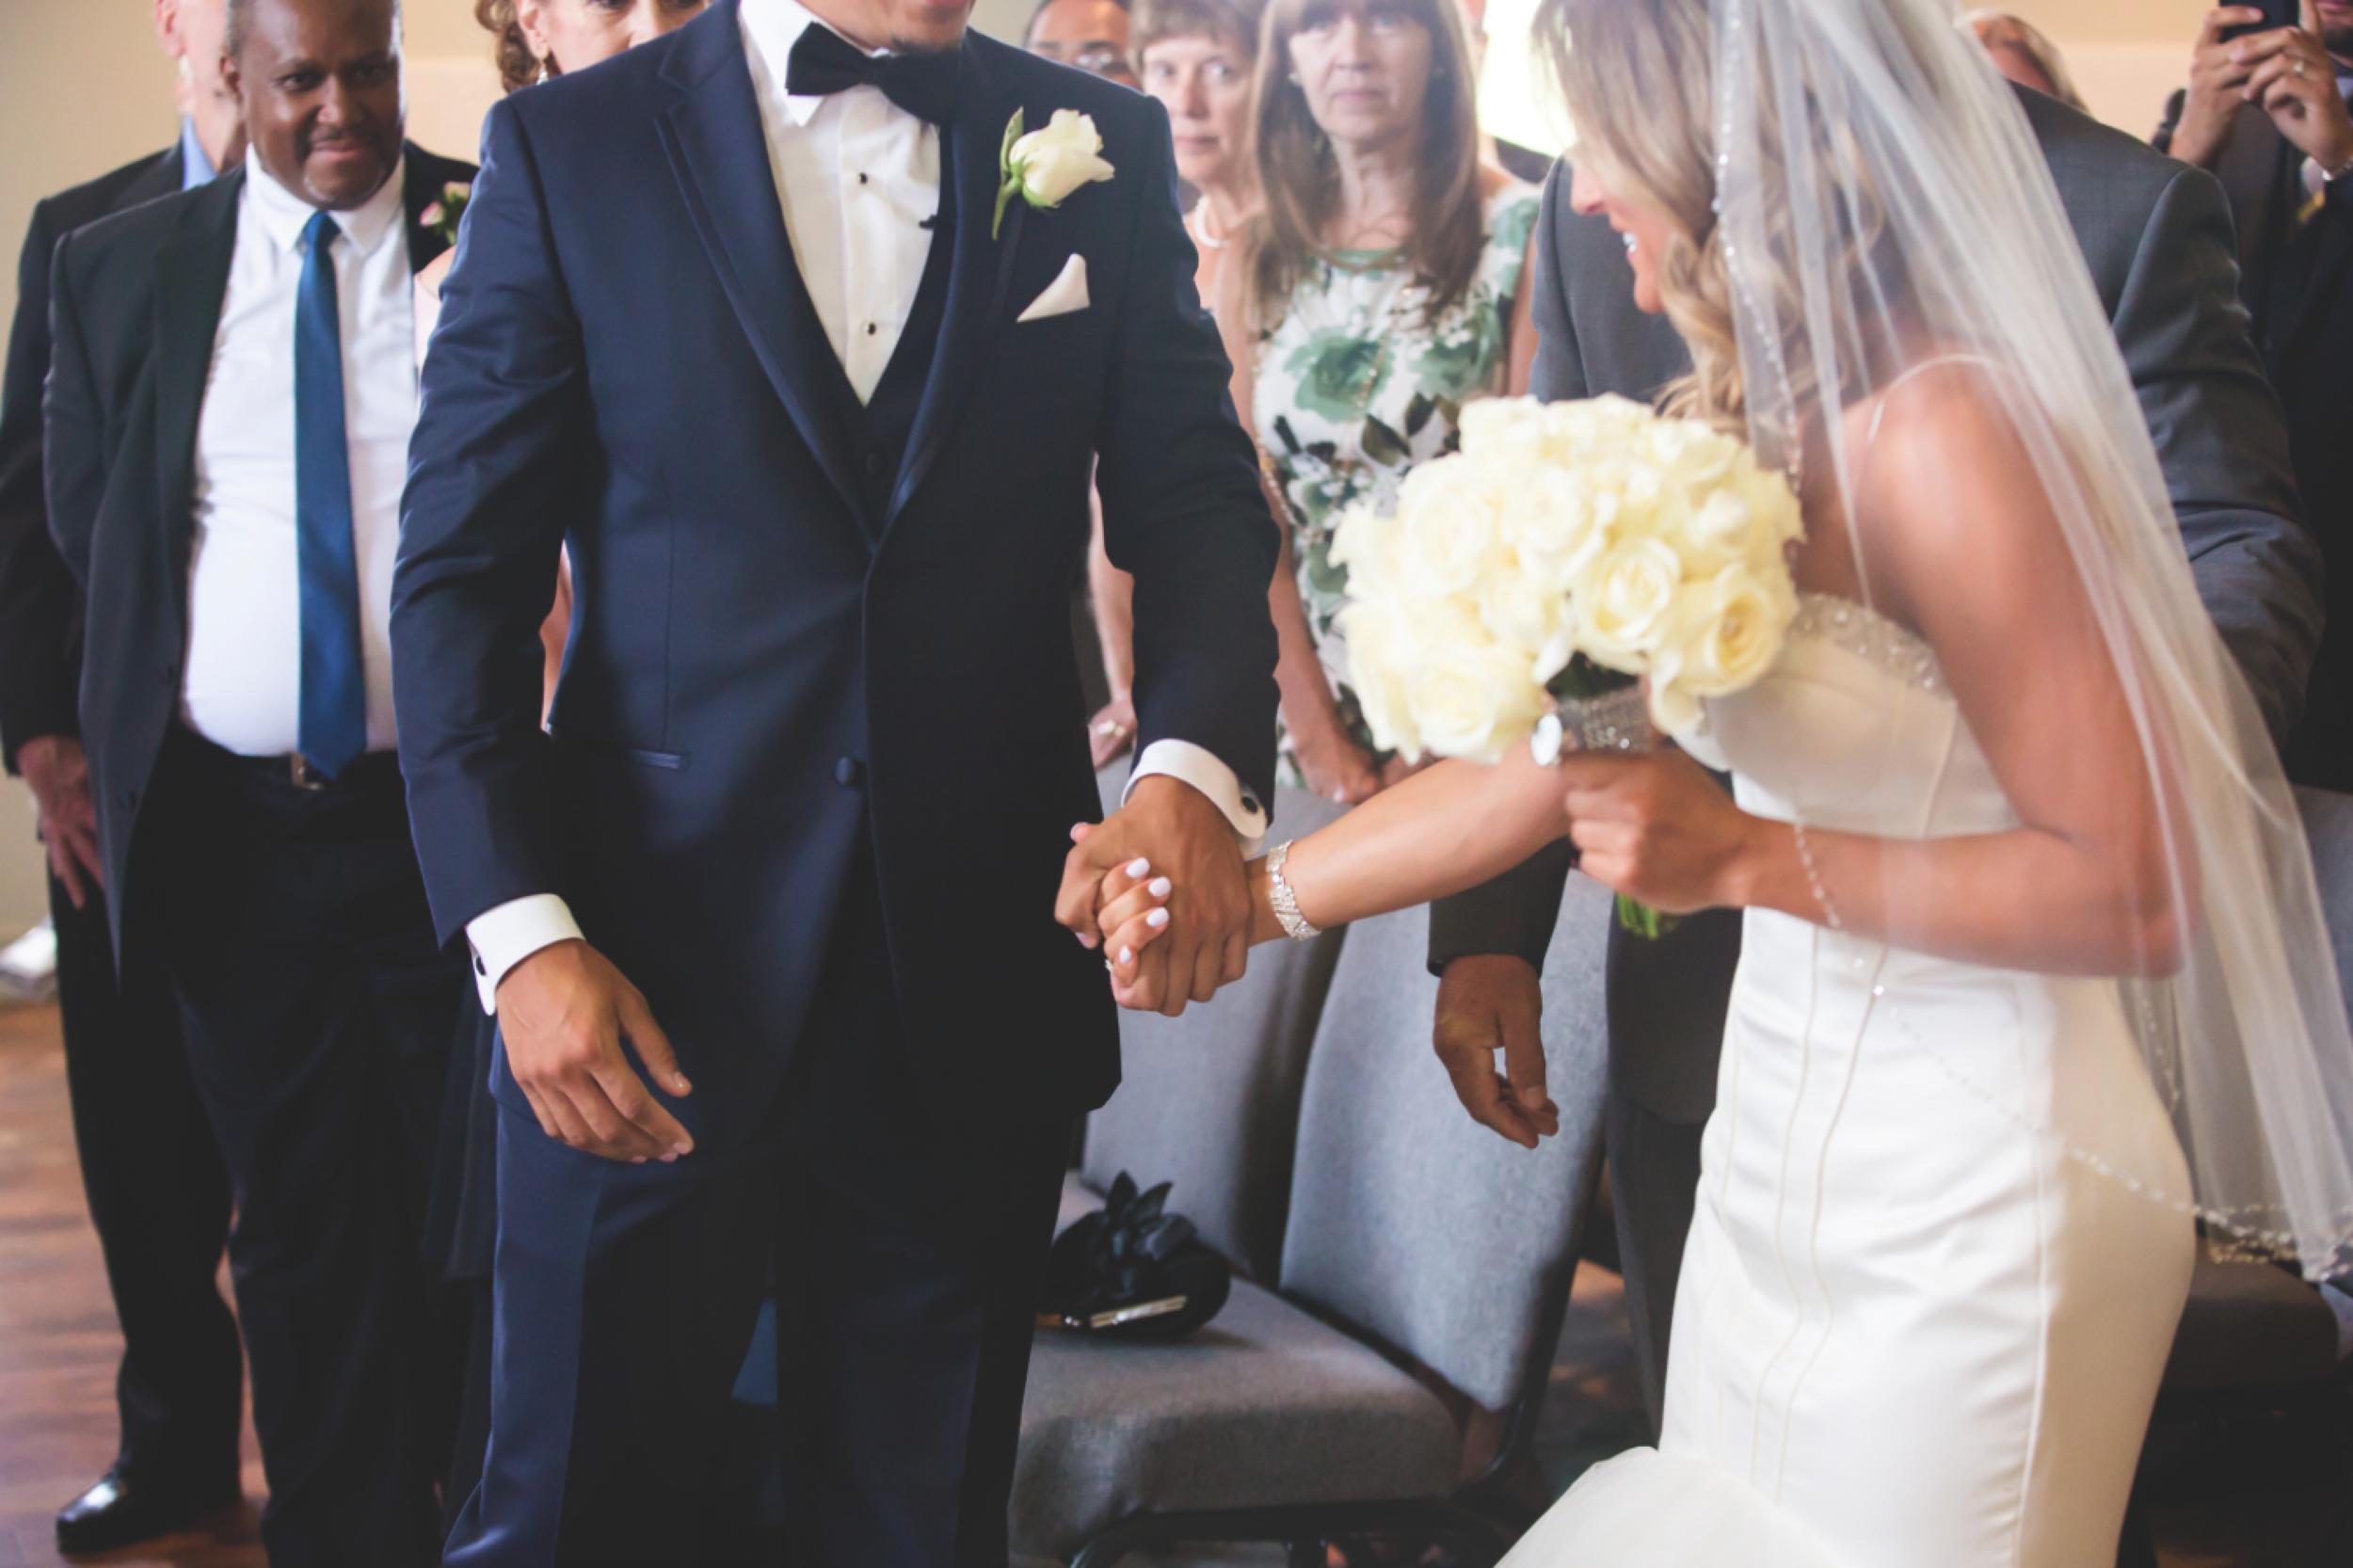 Wedding-Burlington-Convention-Center-Burlington-Oakville-Toronto-Hamilton-Niagara-Wedding-Photographer-Photography-Moments-by-Lauren-Photo-Image-18.png